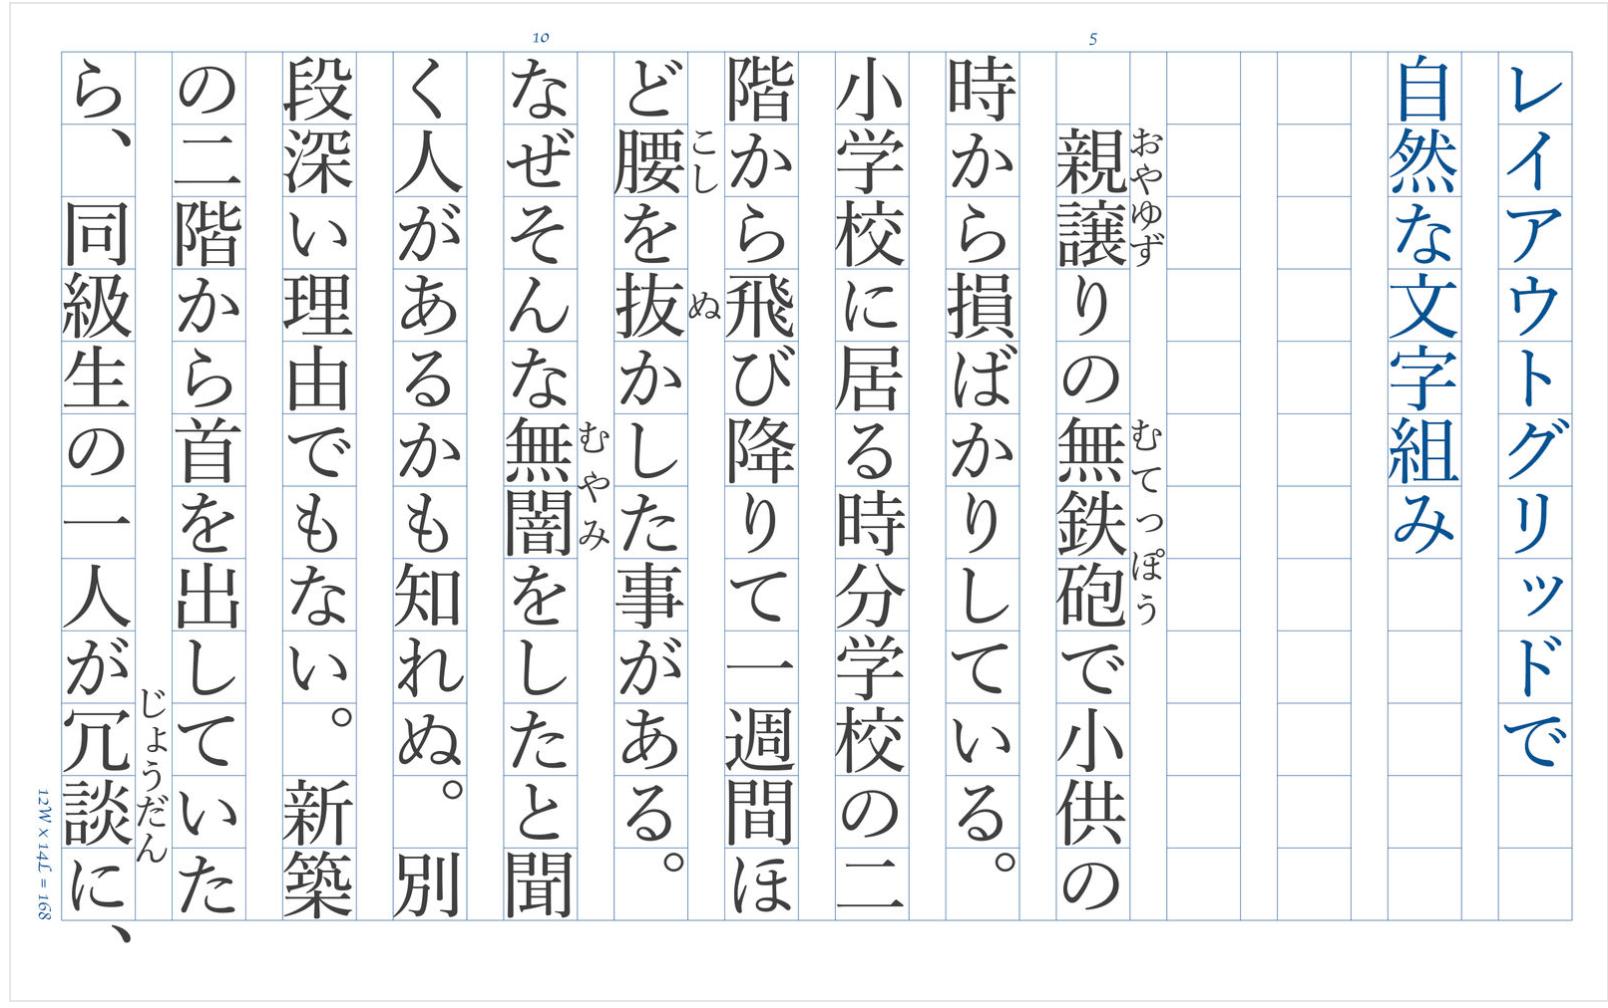 egword Universal beautiful Japanese typography